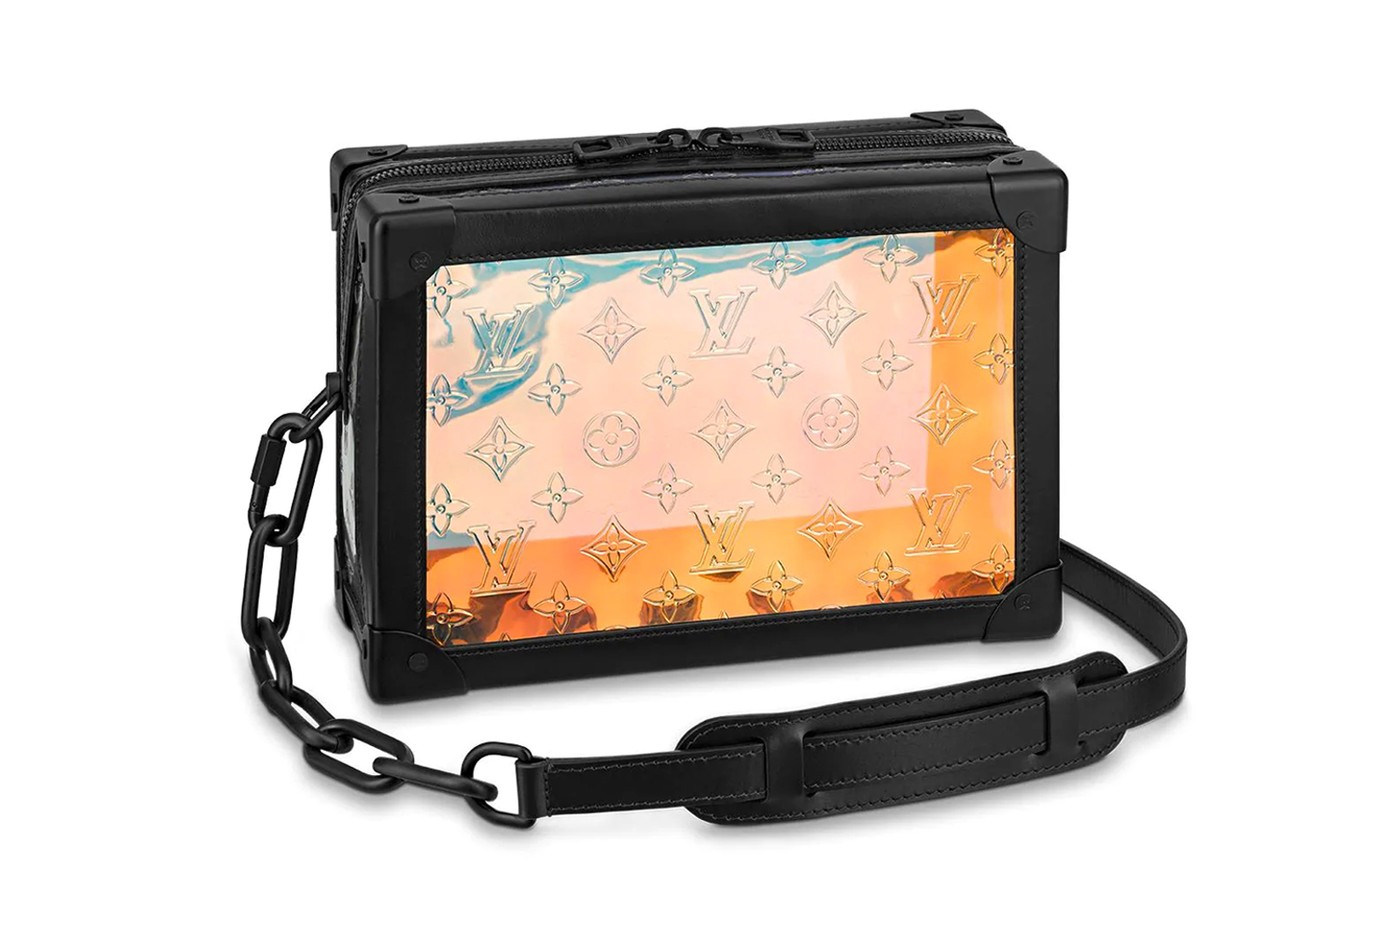 louis vuitton mini soft trunk handbags - Neomag.